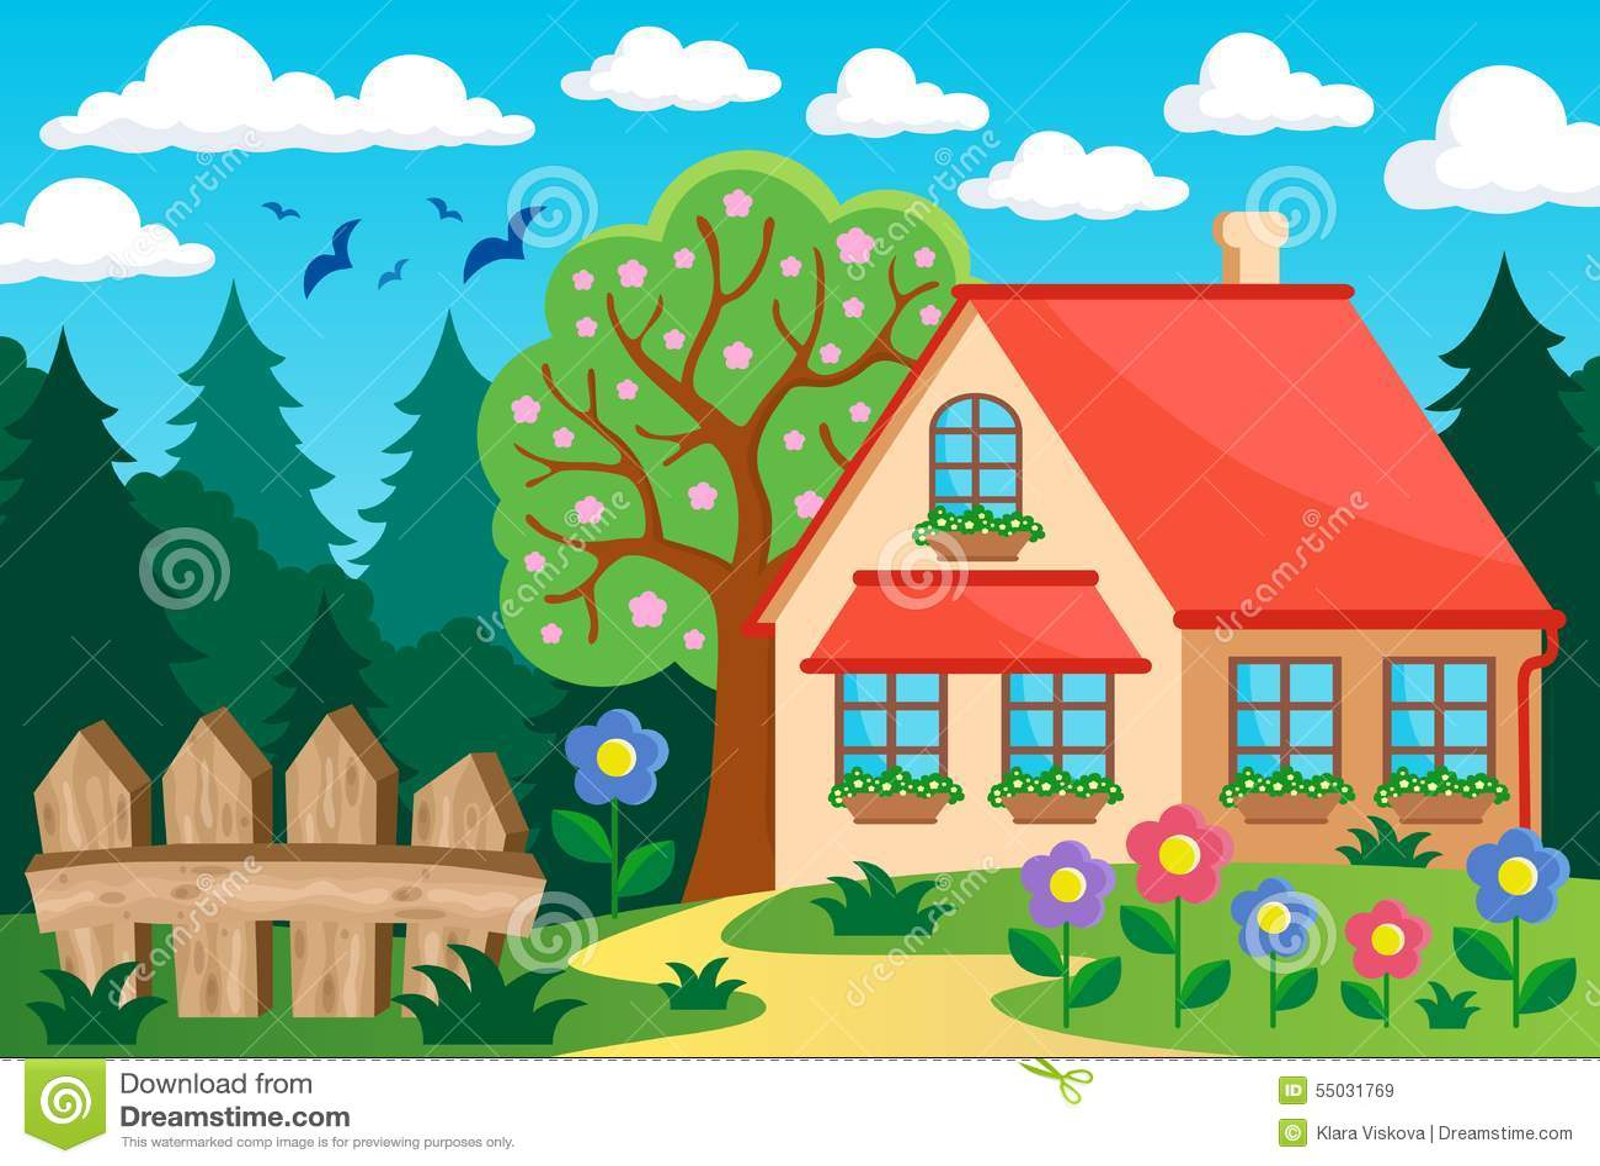 Garden and house theme background 3 stock vector - Arbolitos para jardin ...